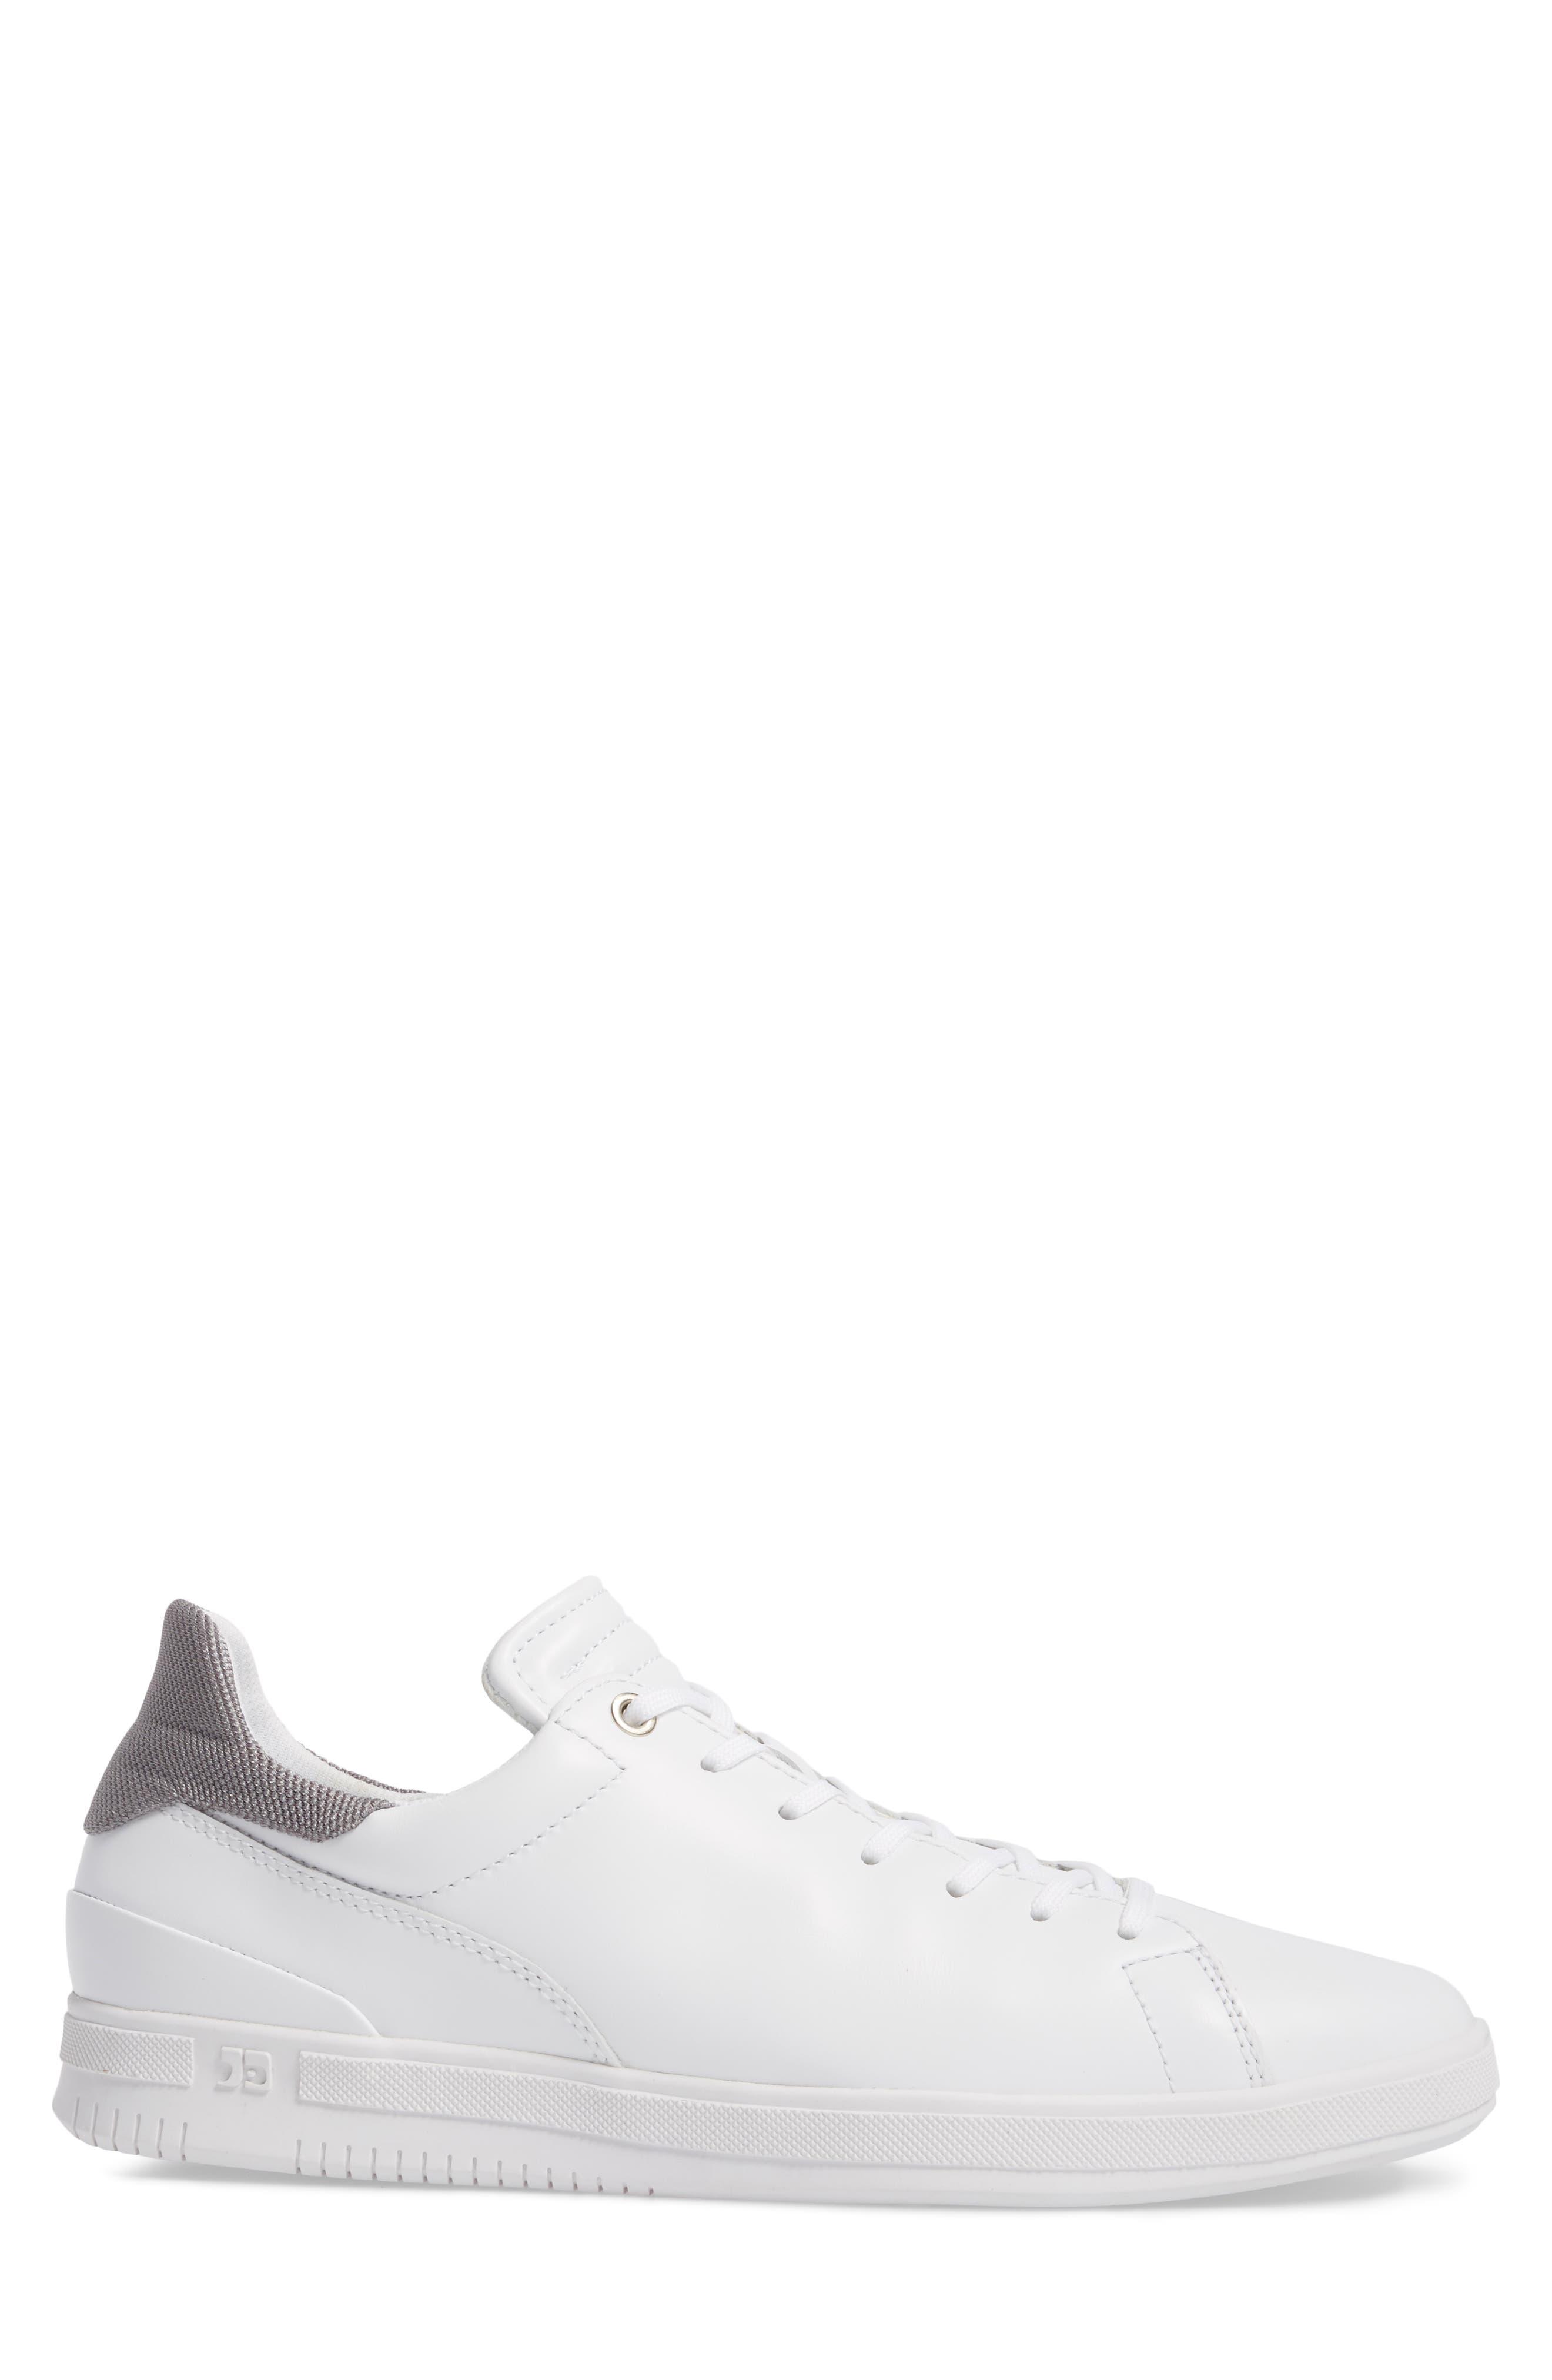 Joe Mama Sneaker,                             Alternate thumbnail 3, color,                             WHITE LEATHER